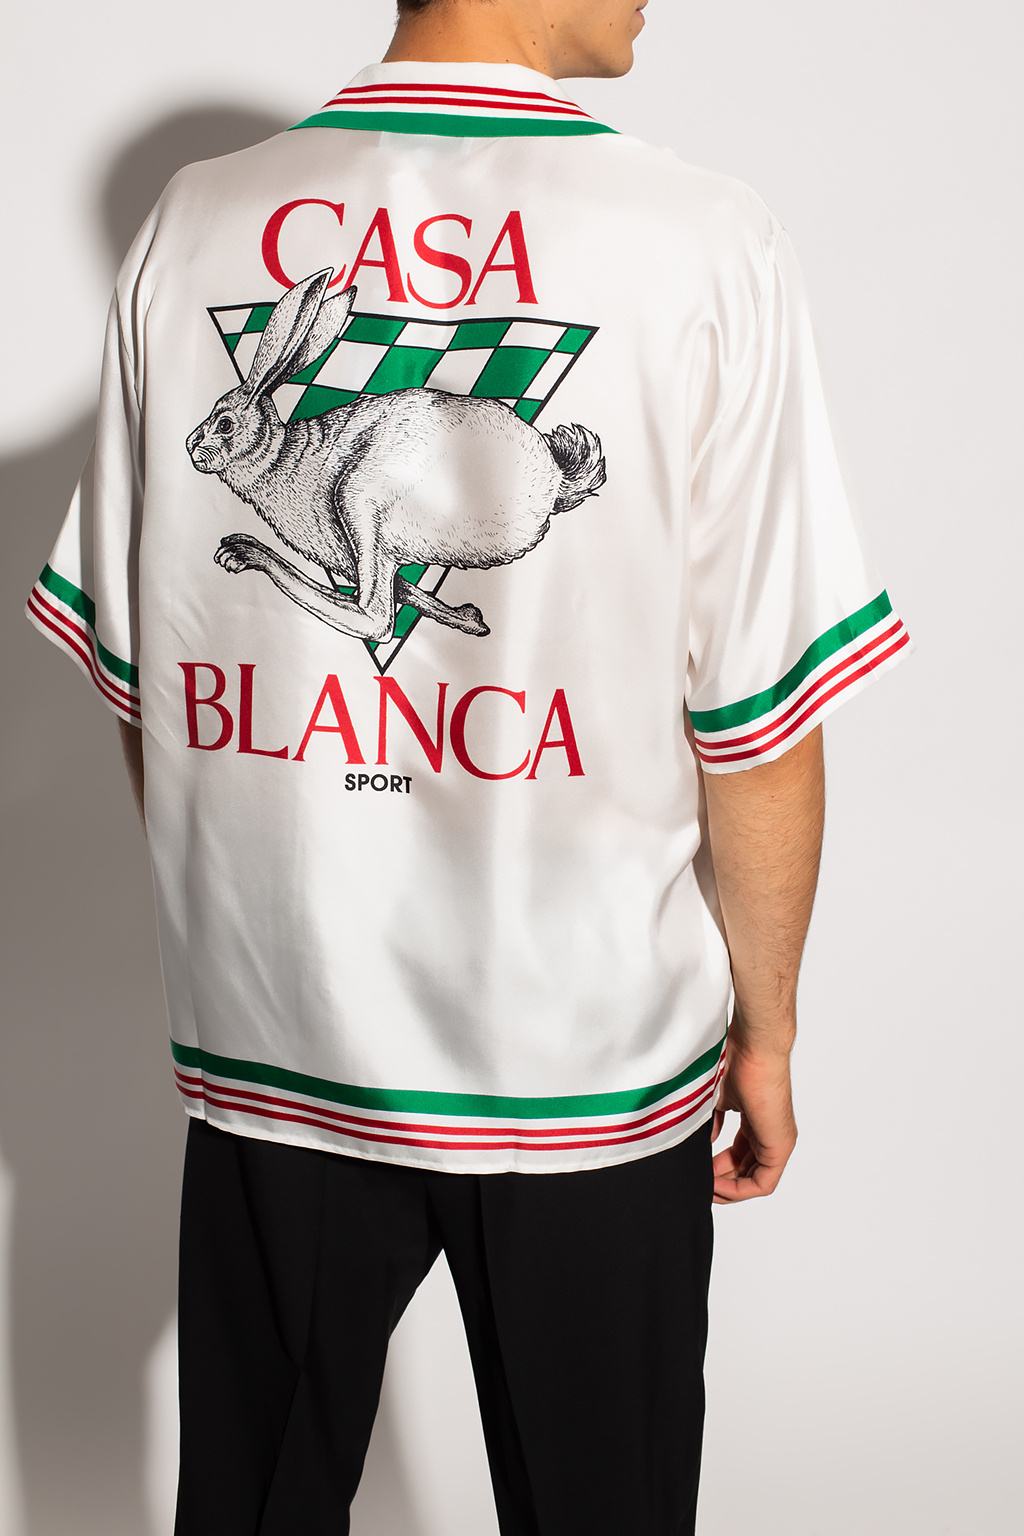 Casablanca Silk shirt with short sleeves